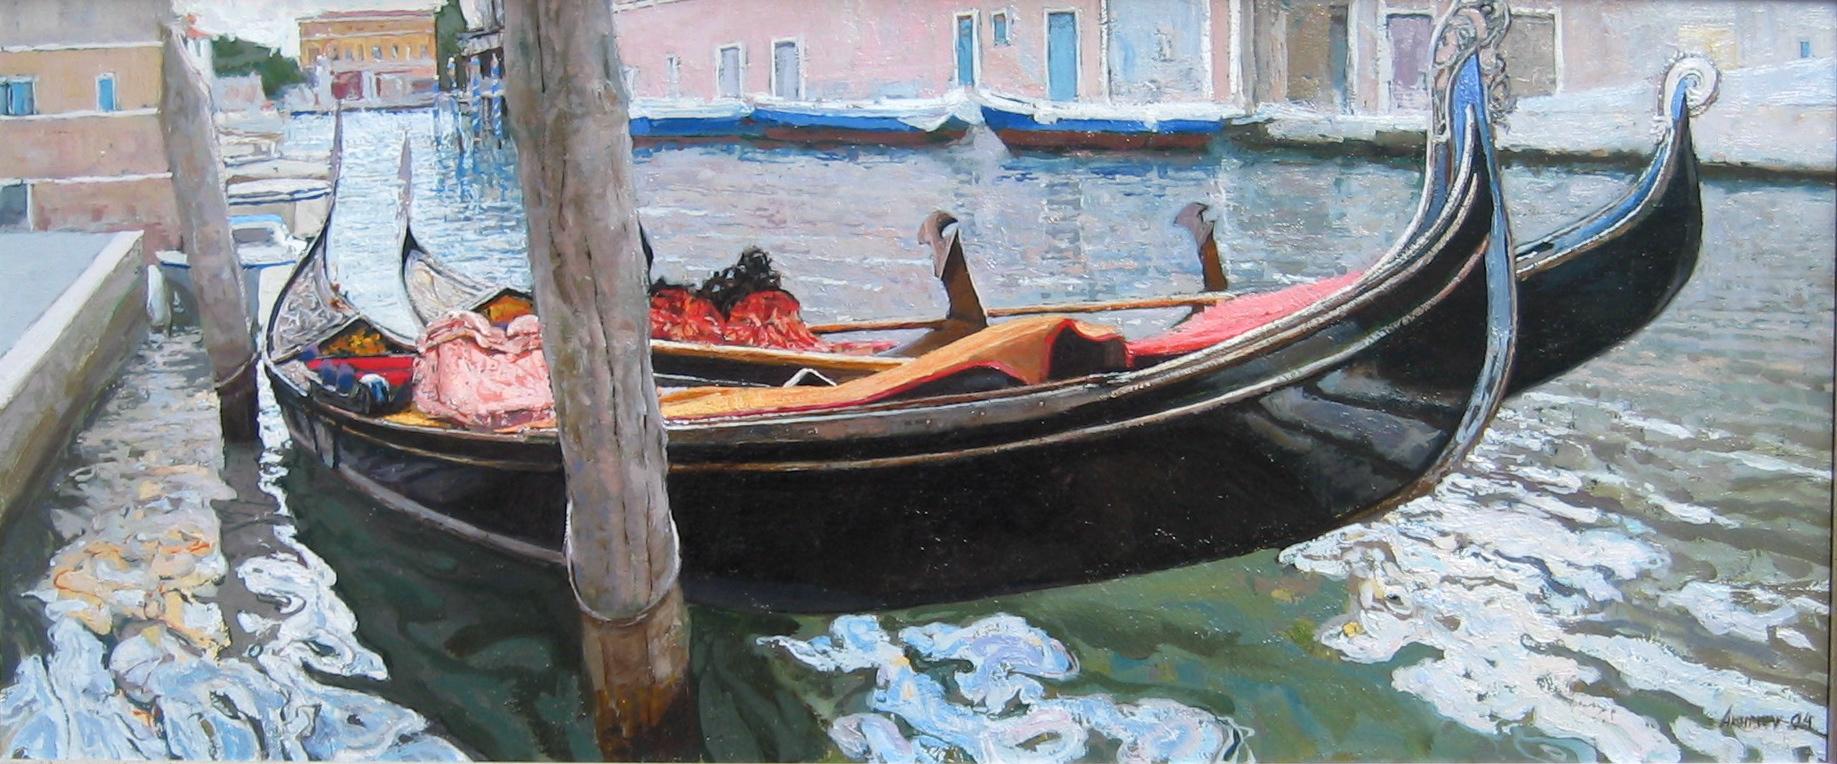 Venice by  Daud Akhriev - Masterpiece Online